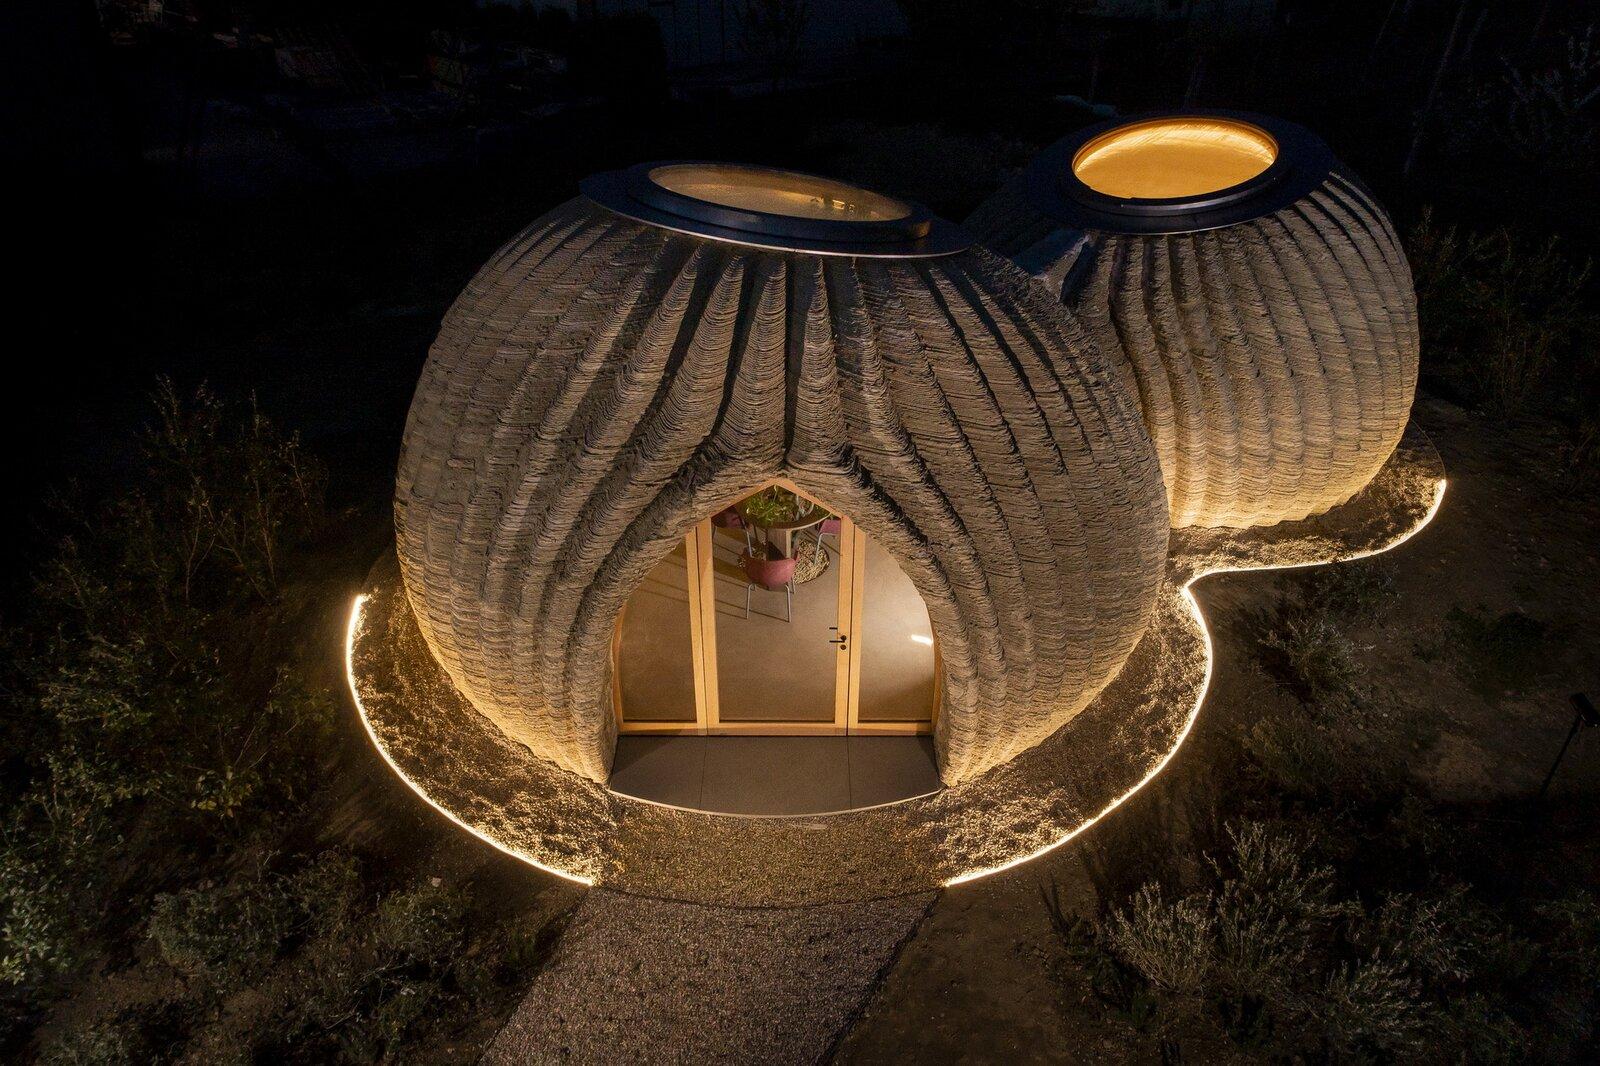 TECLA 3D-printed home Mario Cucinella Architects WASP